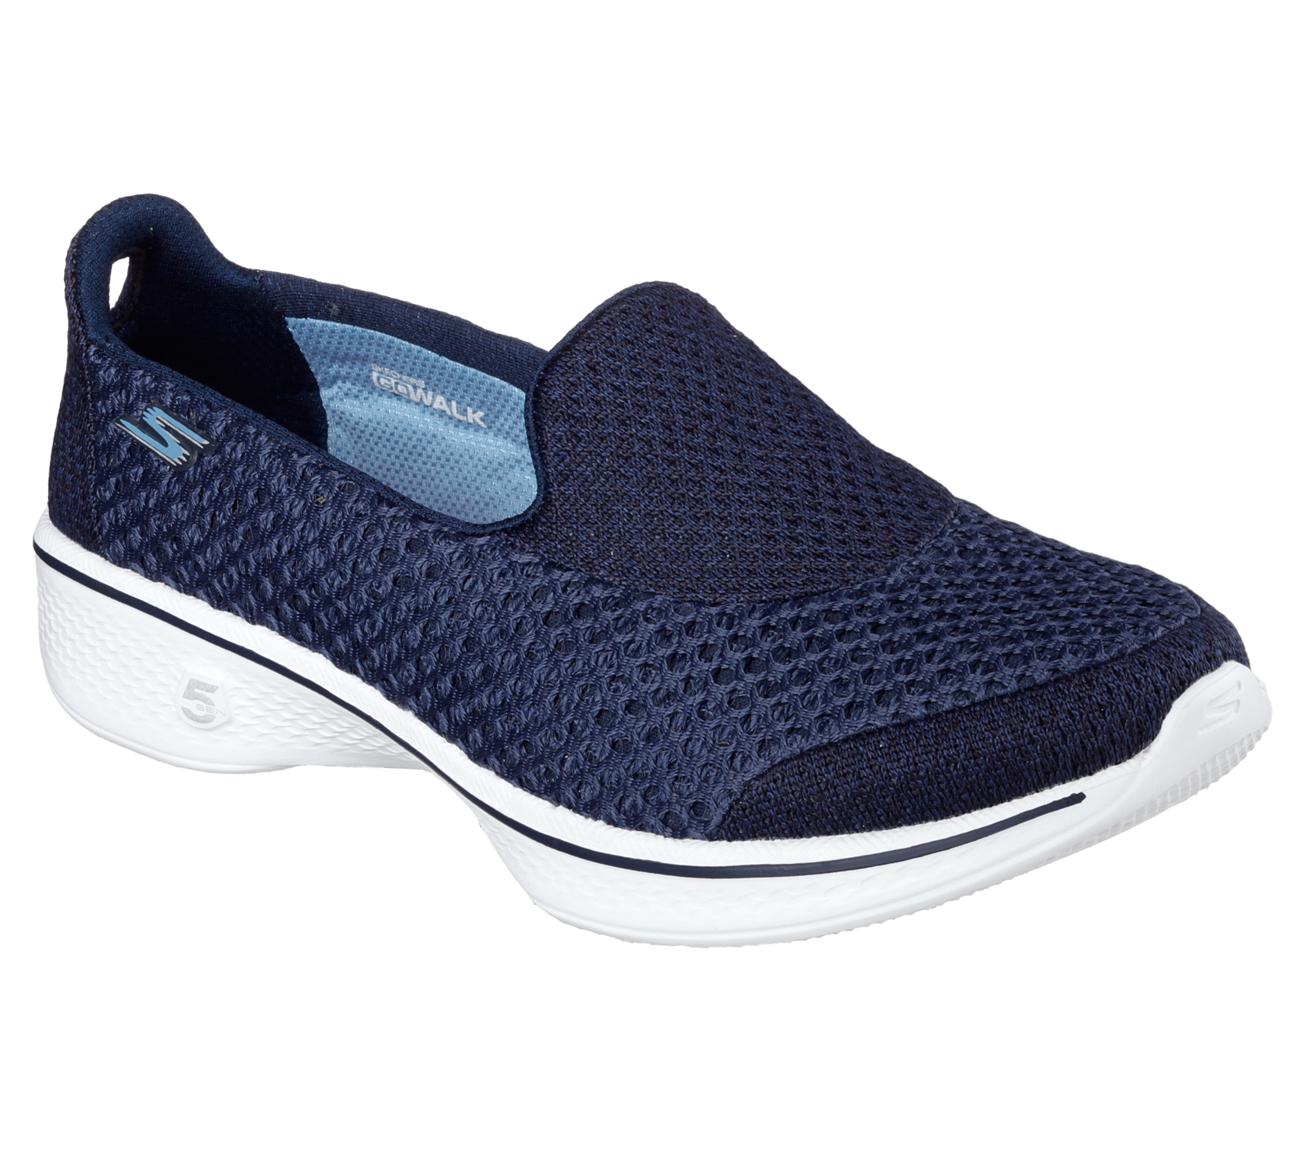 Skechers Anti Slip Shoes